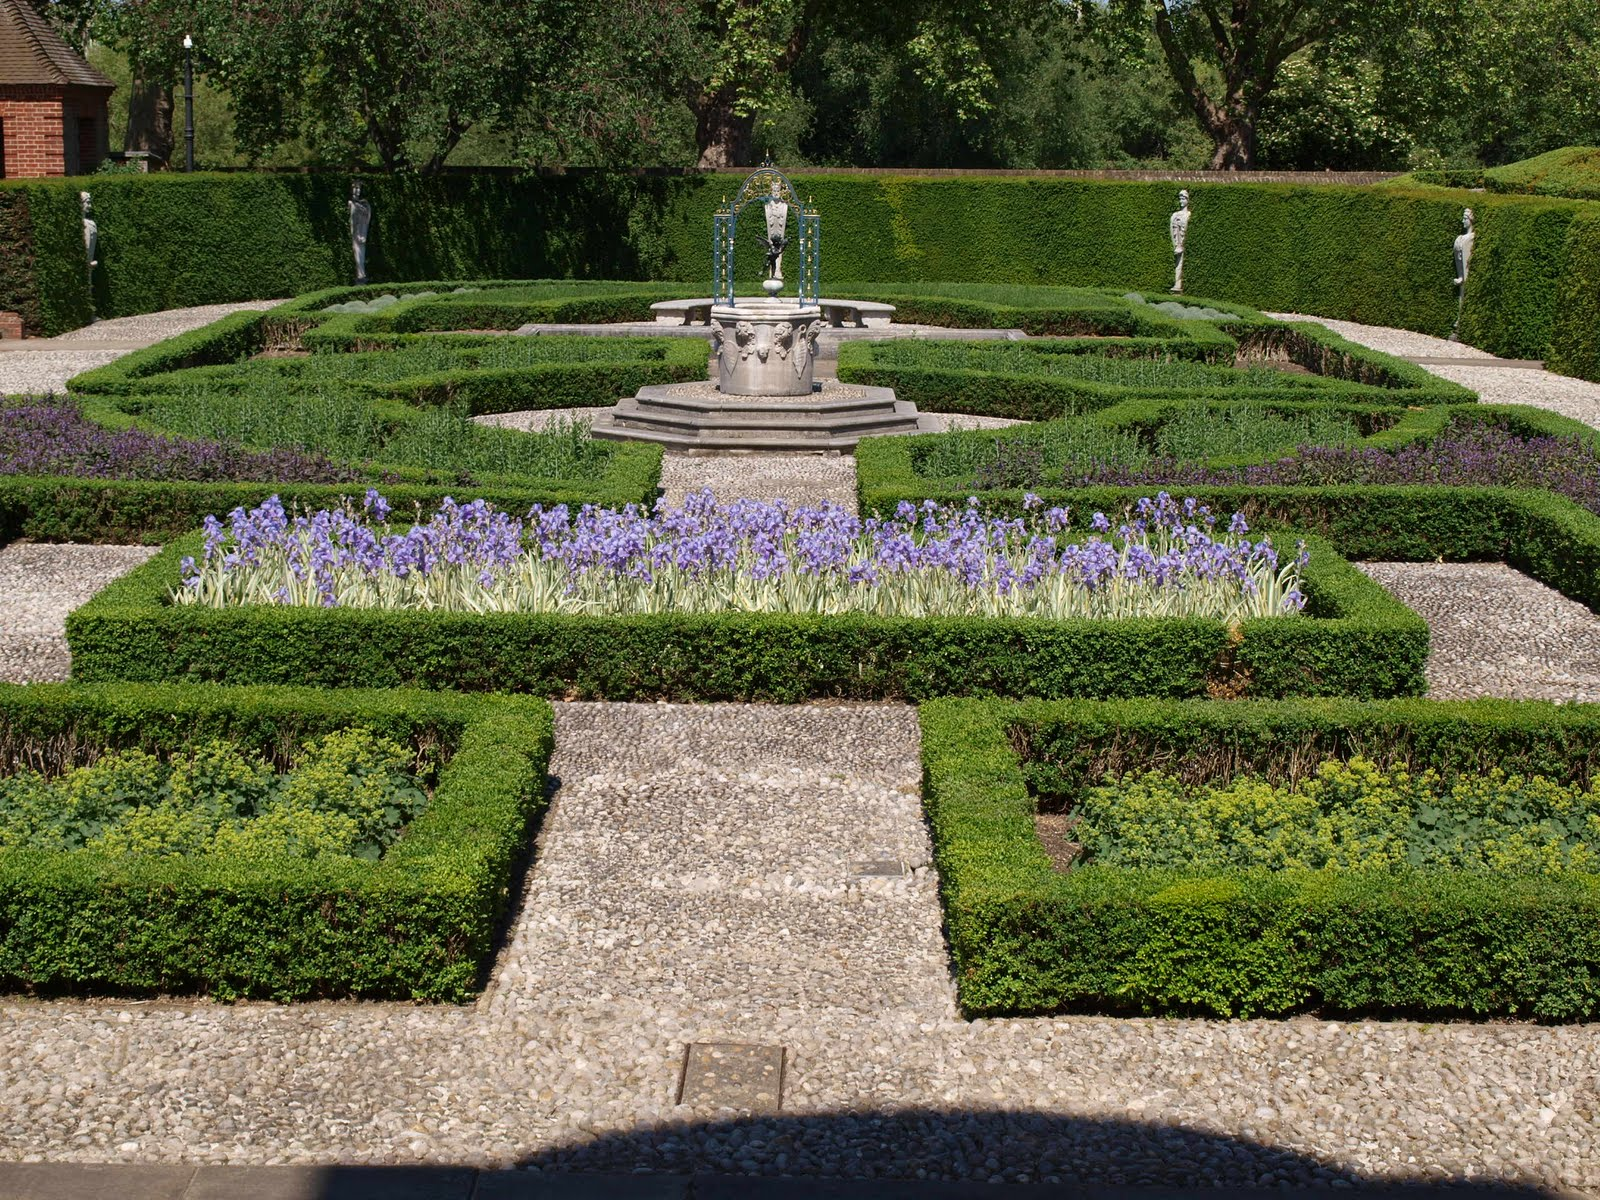 My cottage garden kew gardens london england for Formal garden